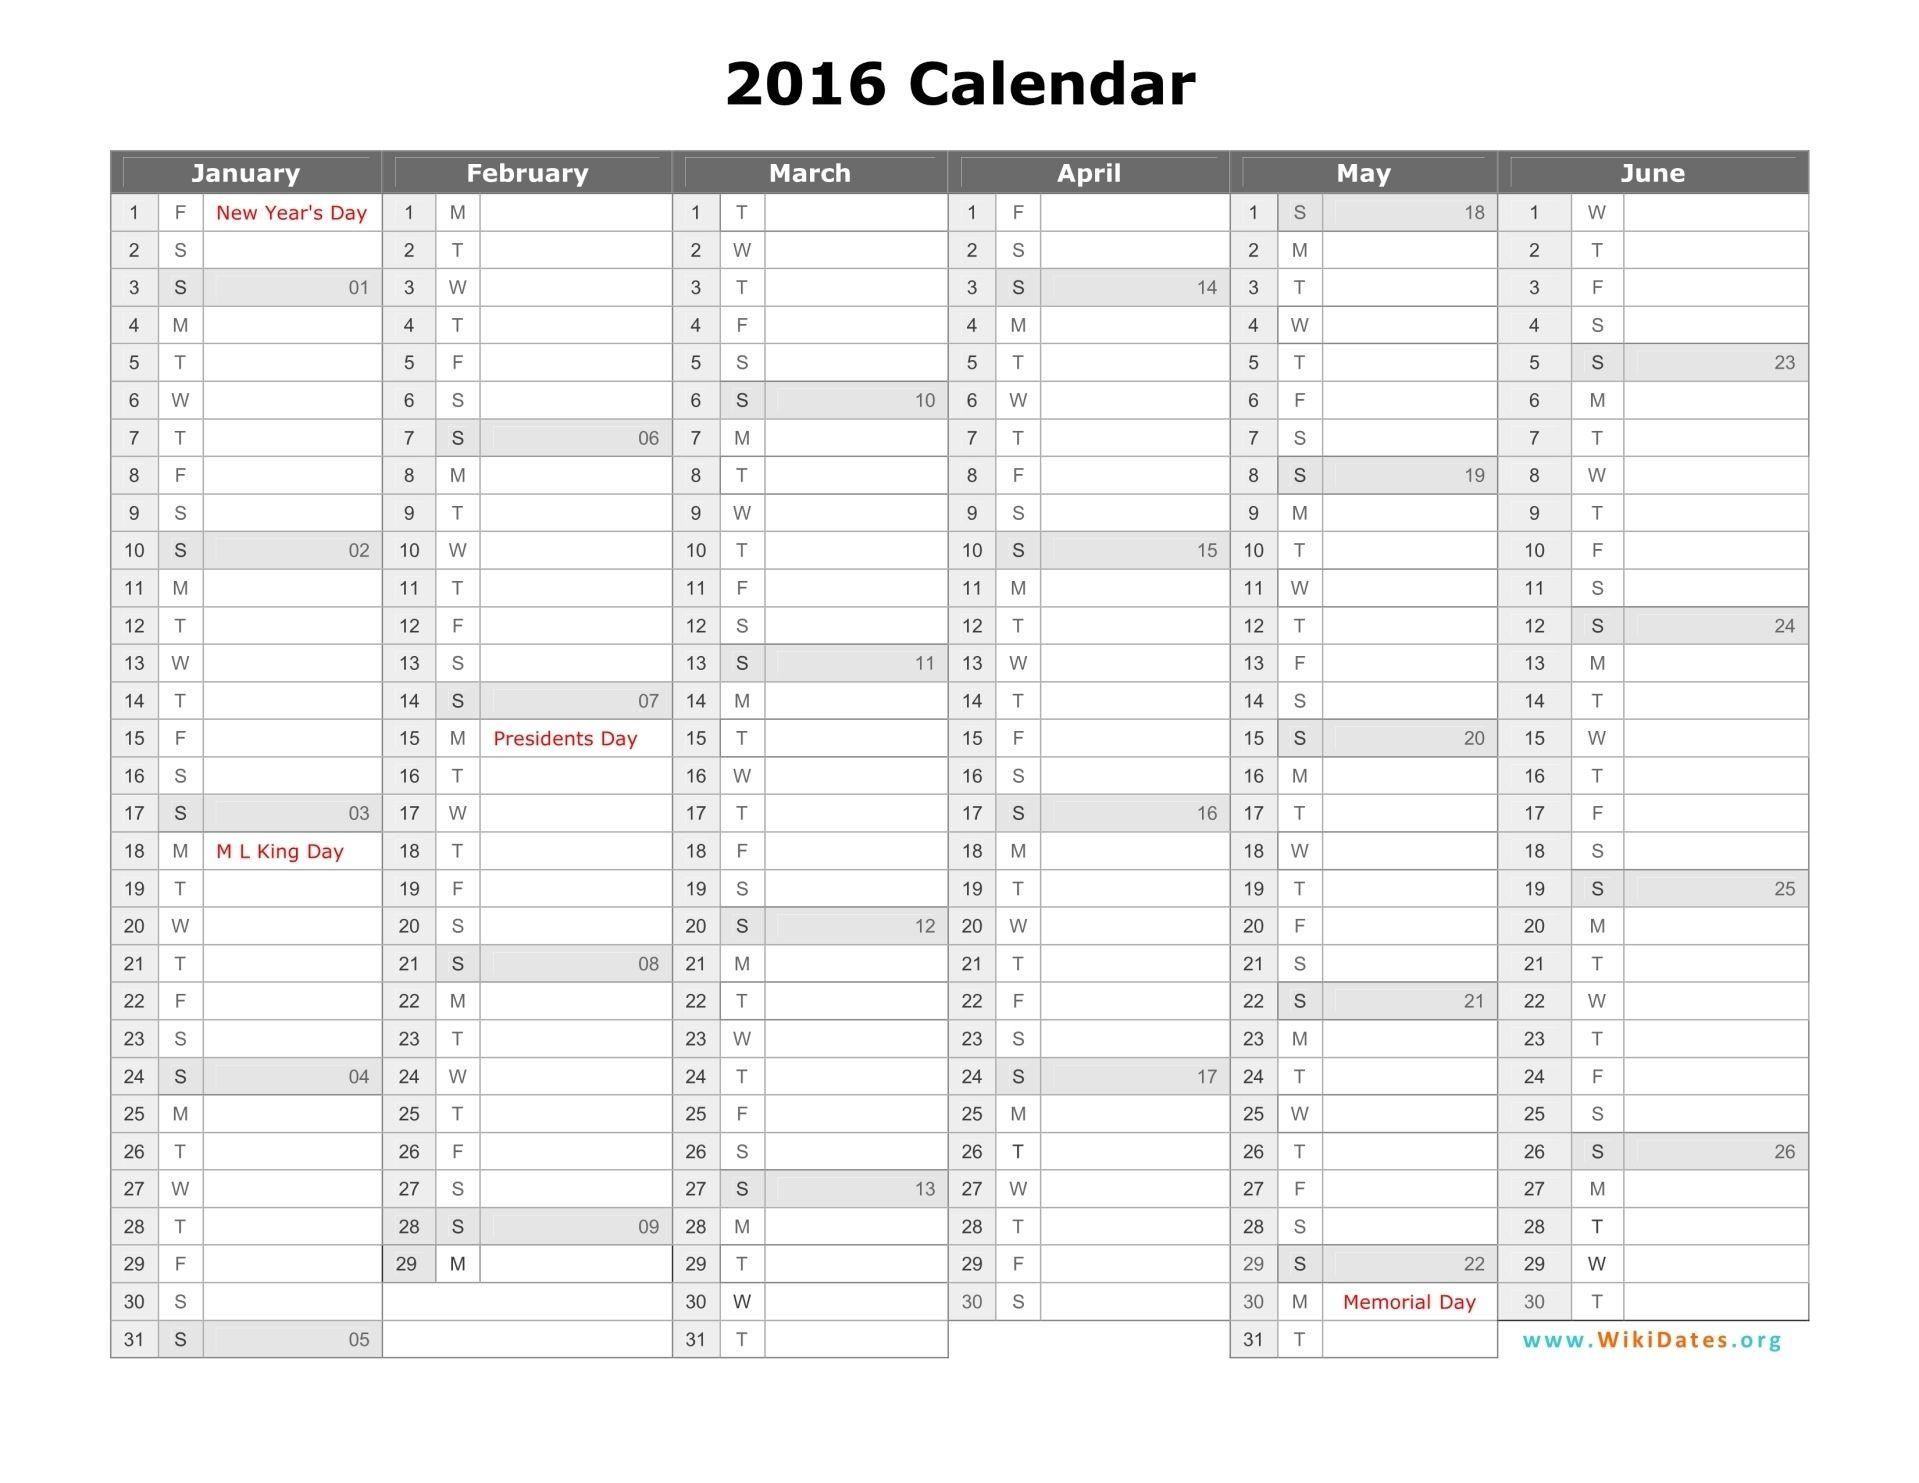 2016 calendar template 09 Annual calendar printable